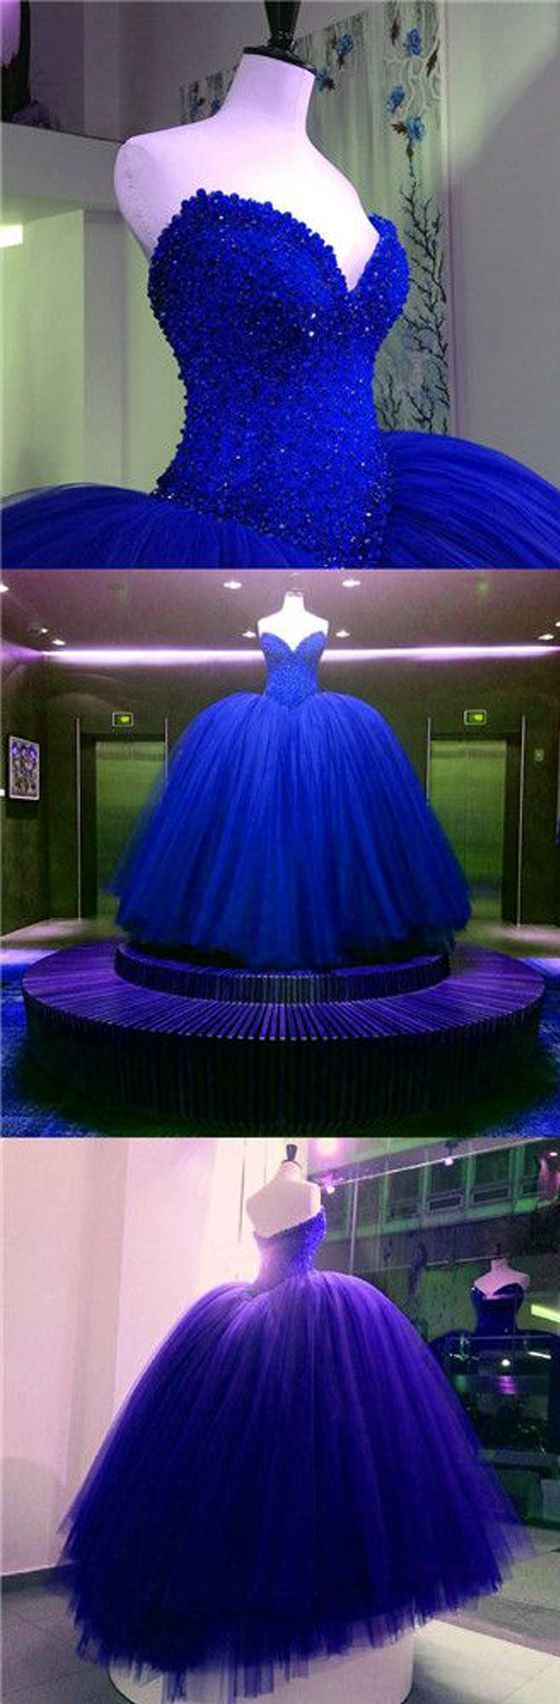 Royal blue sparkle wedding dress sweetheart ball bridal gowns floor